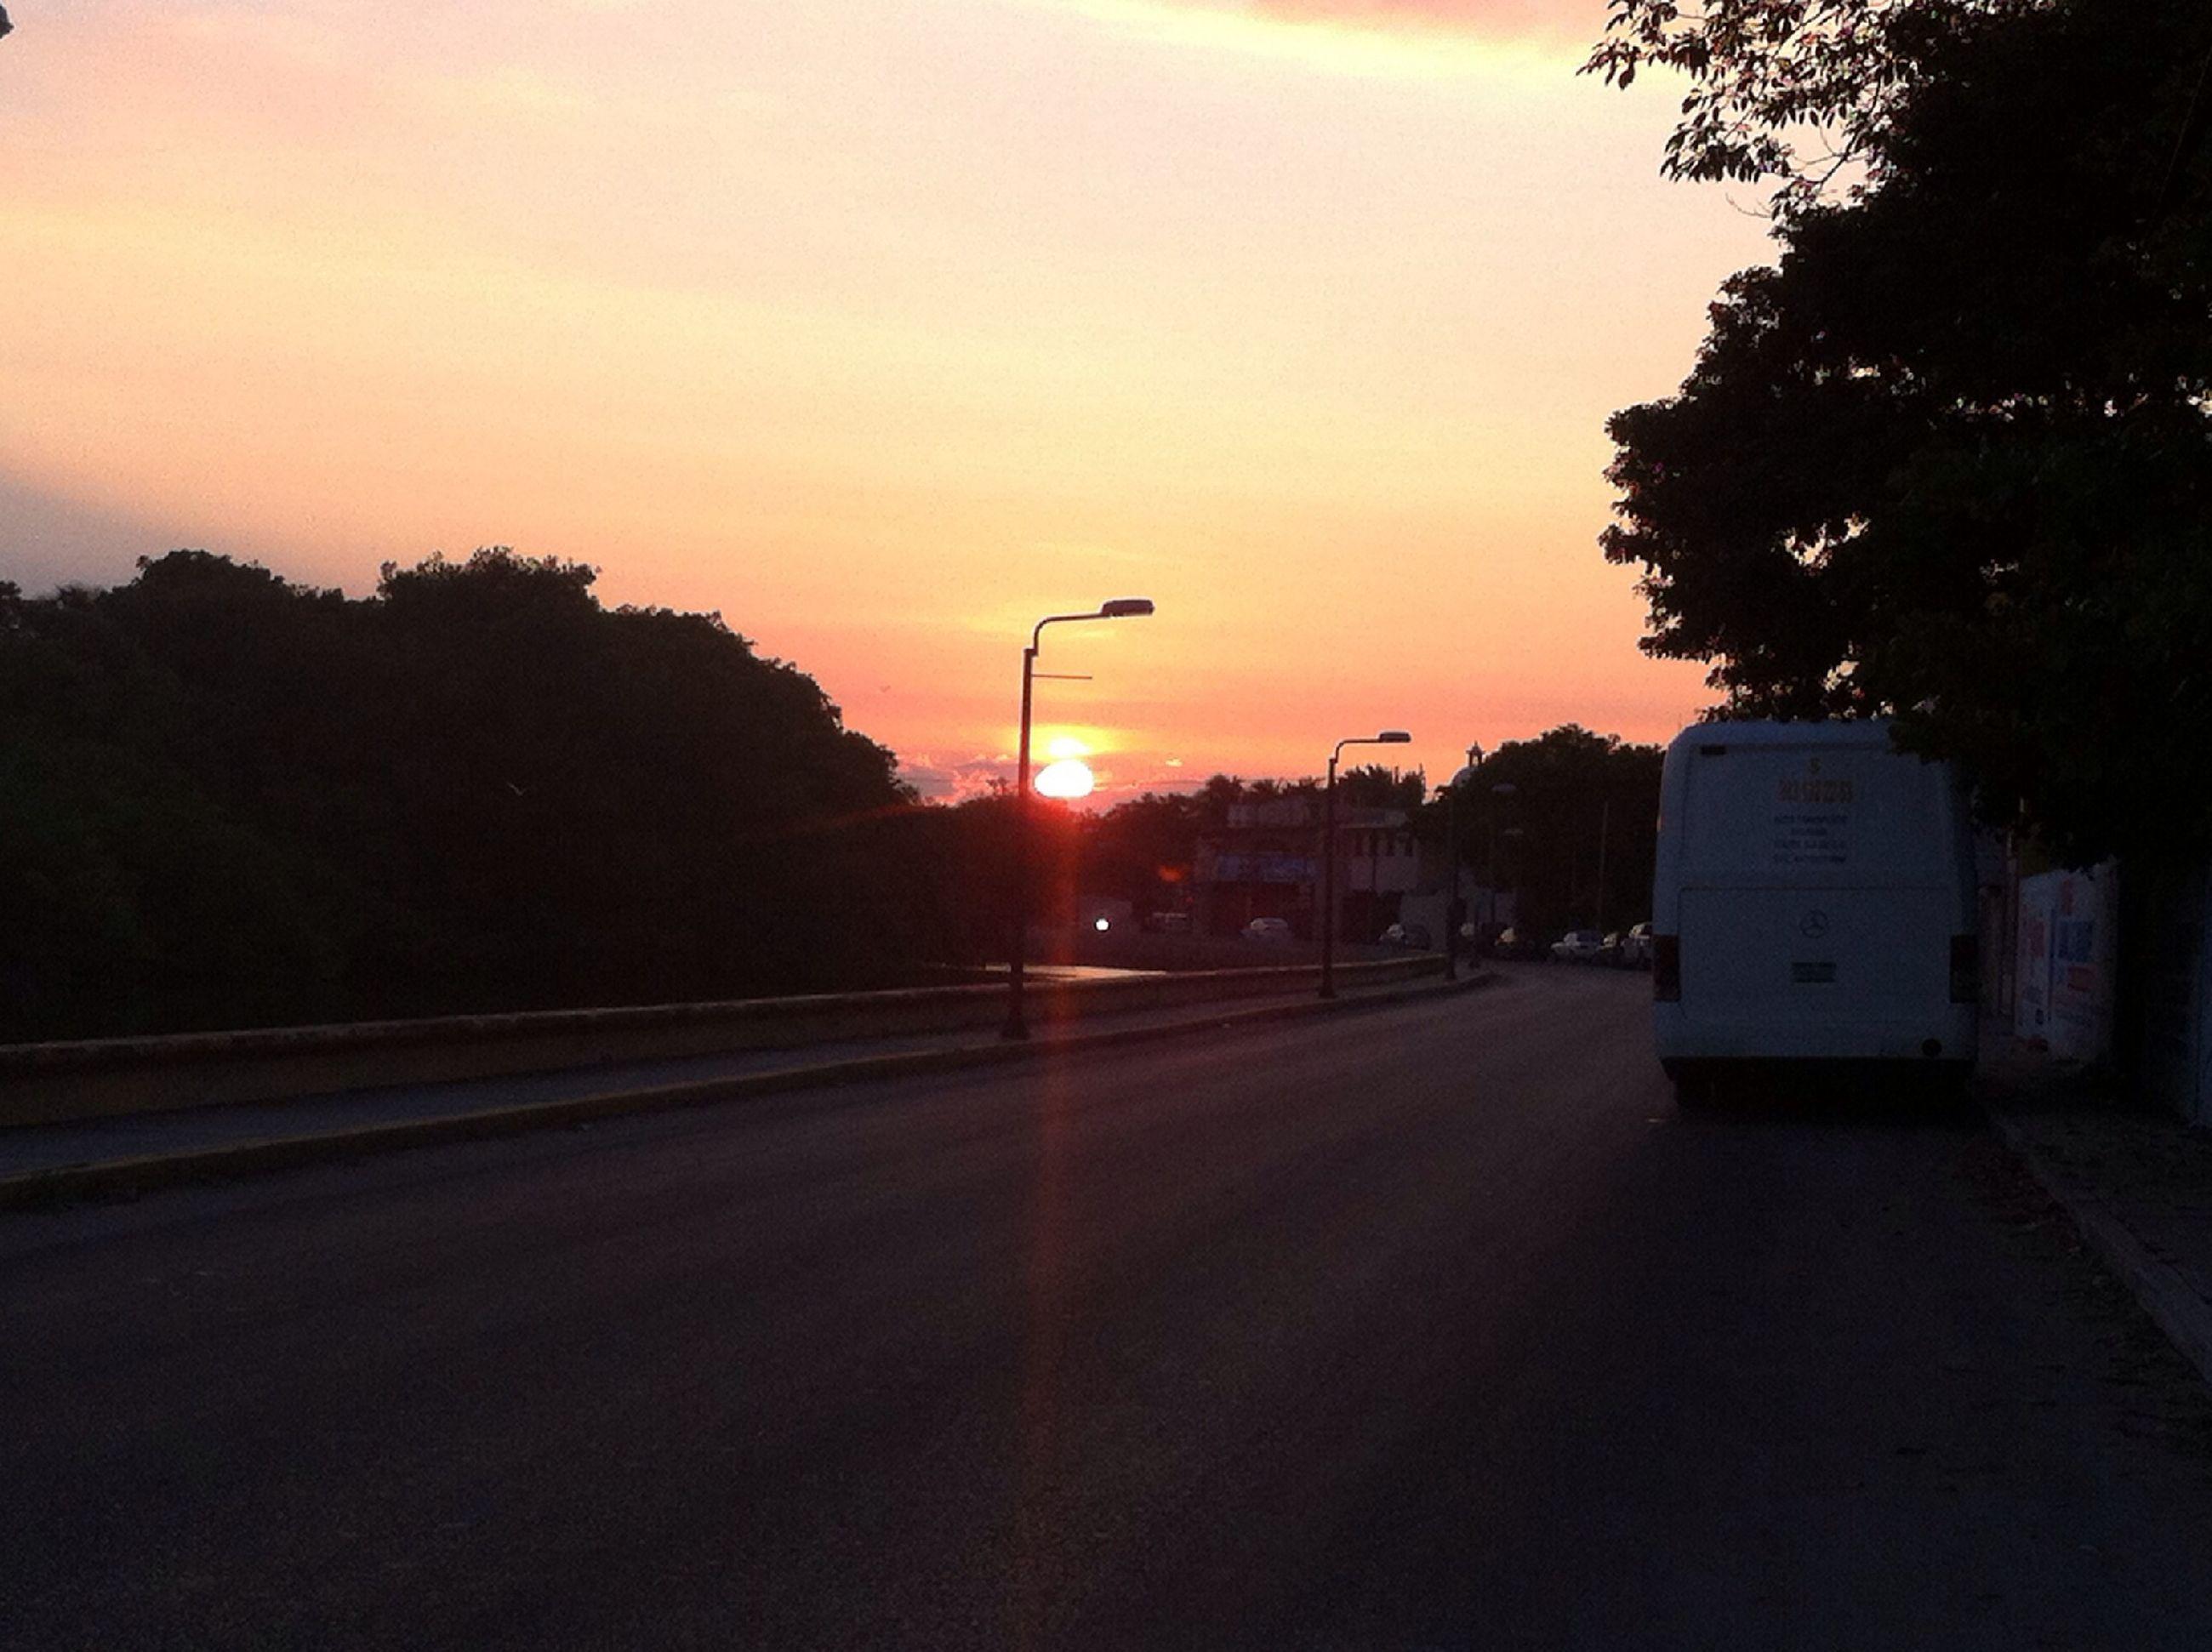 sunset, transportation, road, the way forward, tree, silhouette, street light, street, sky, orange color, car, diminishing perspective, road marking, empty, illuminated, vanishing point, no people, outdoors, nature, dusk